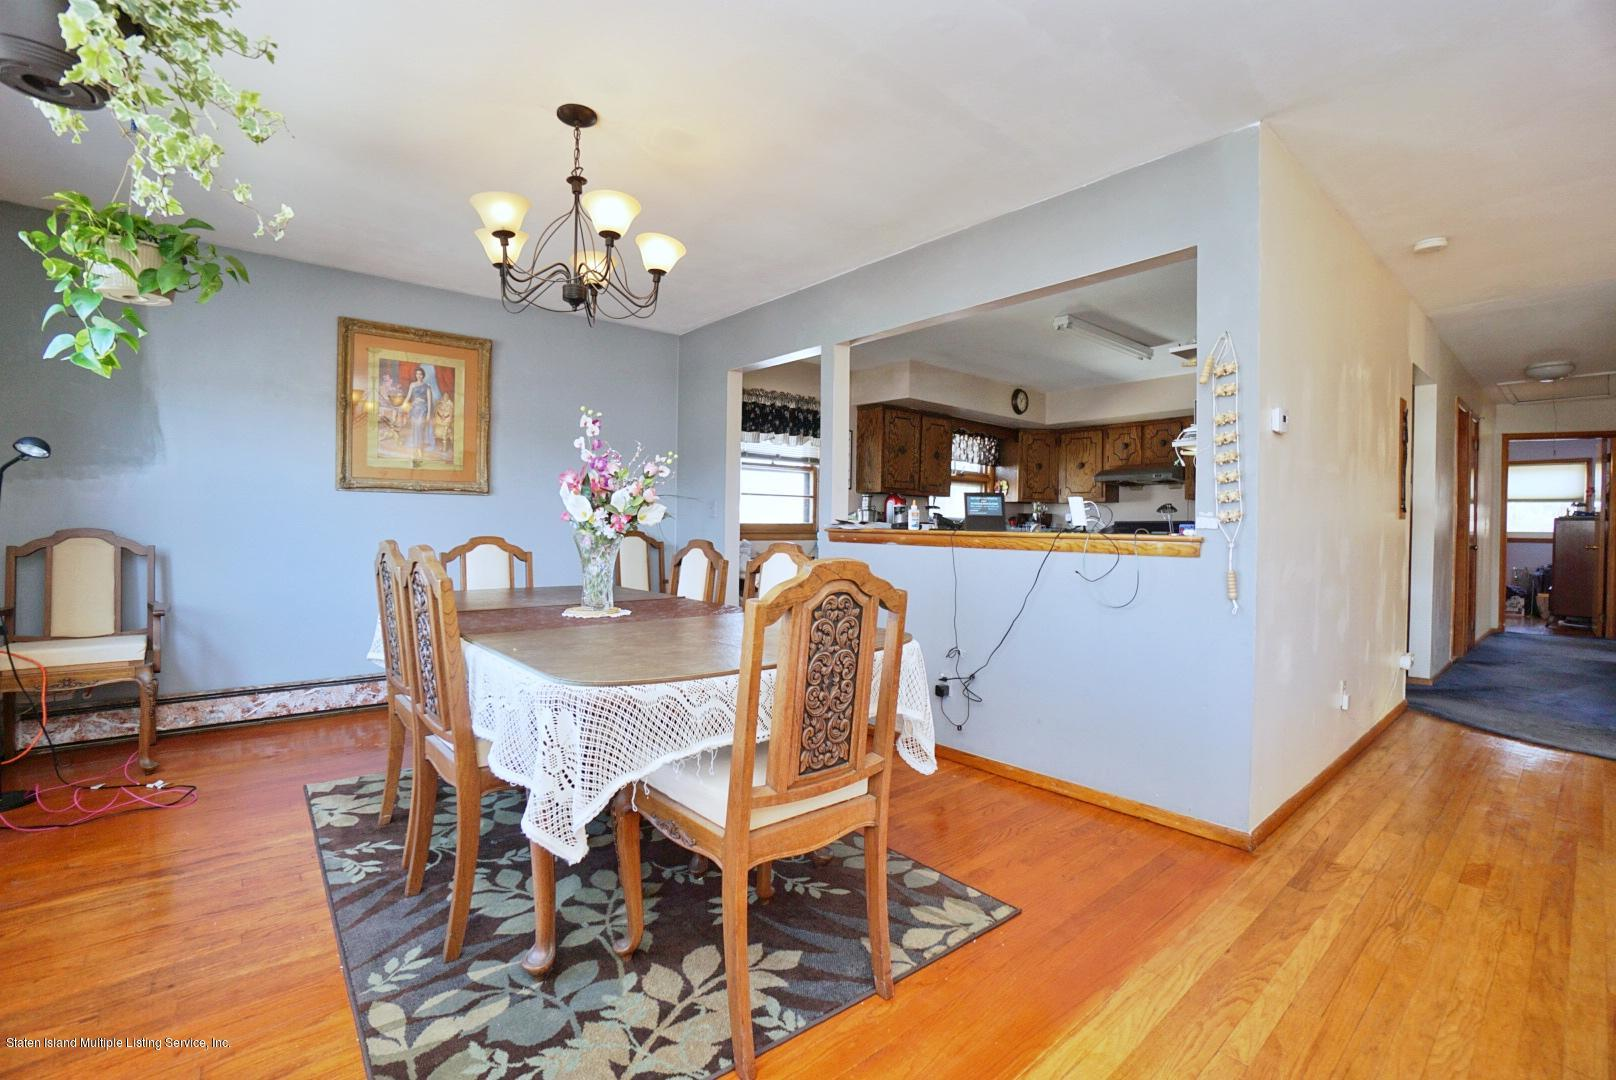 Single Family - Detached 495 Winchester Avenue  Staten Island, NY 10312, MLS-1136561-9